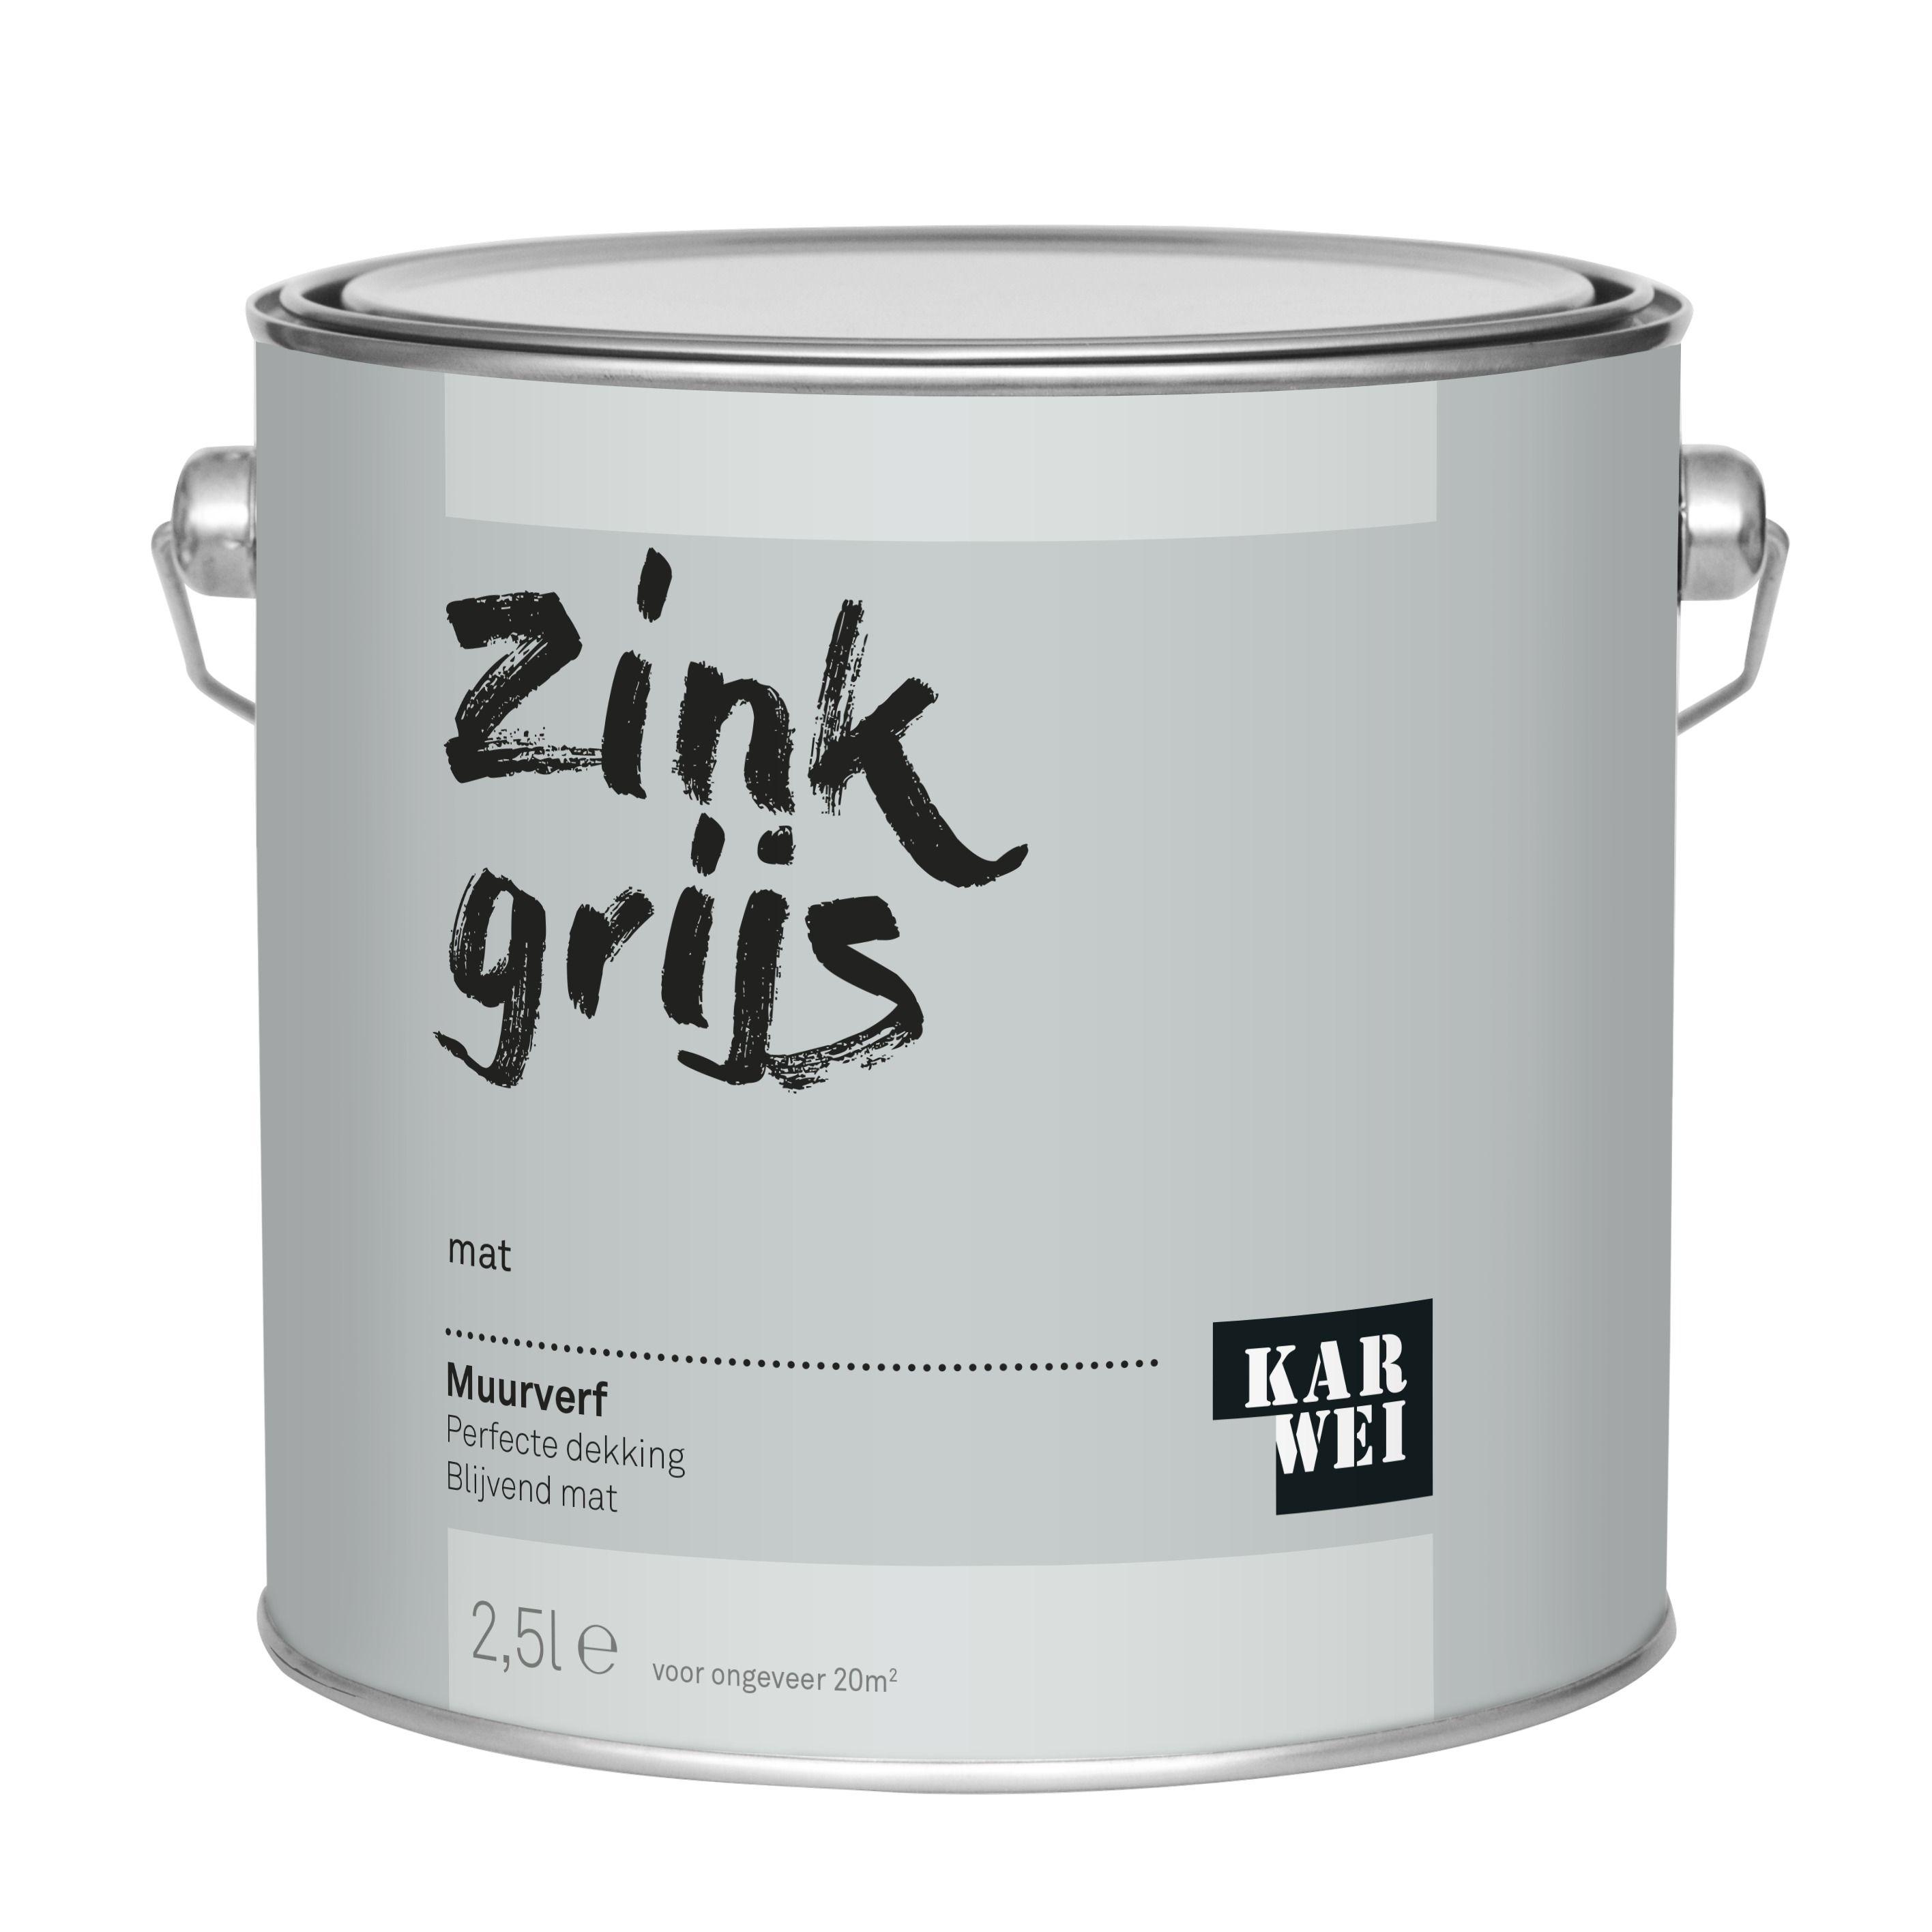 KARWEI muurverf zink grijs mat 2,5 liter kopen? muurverf